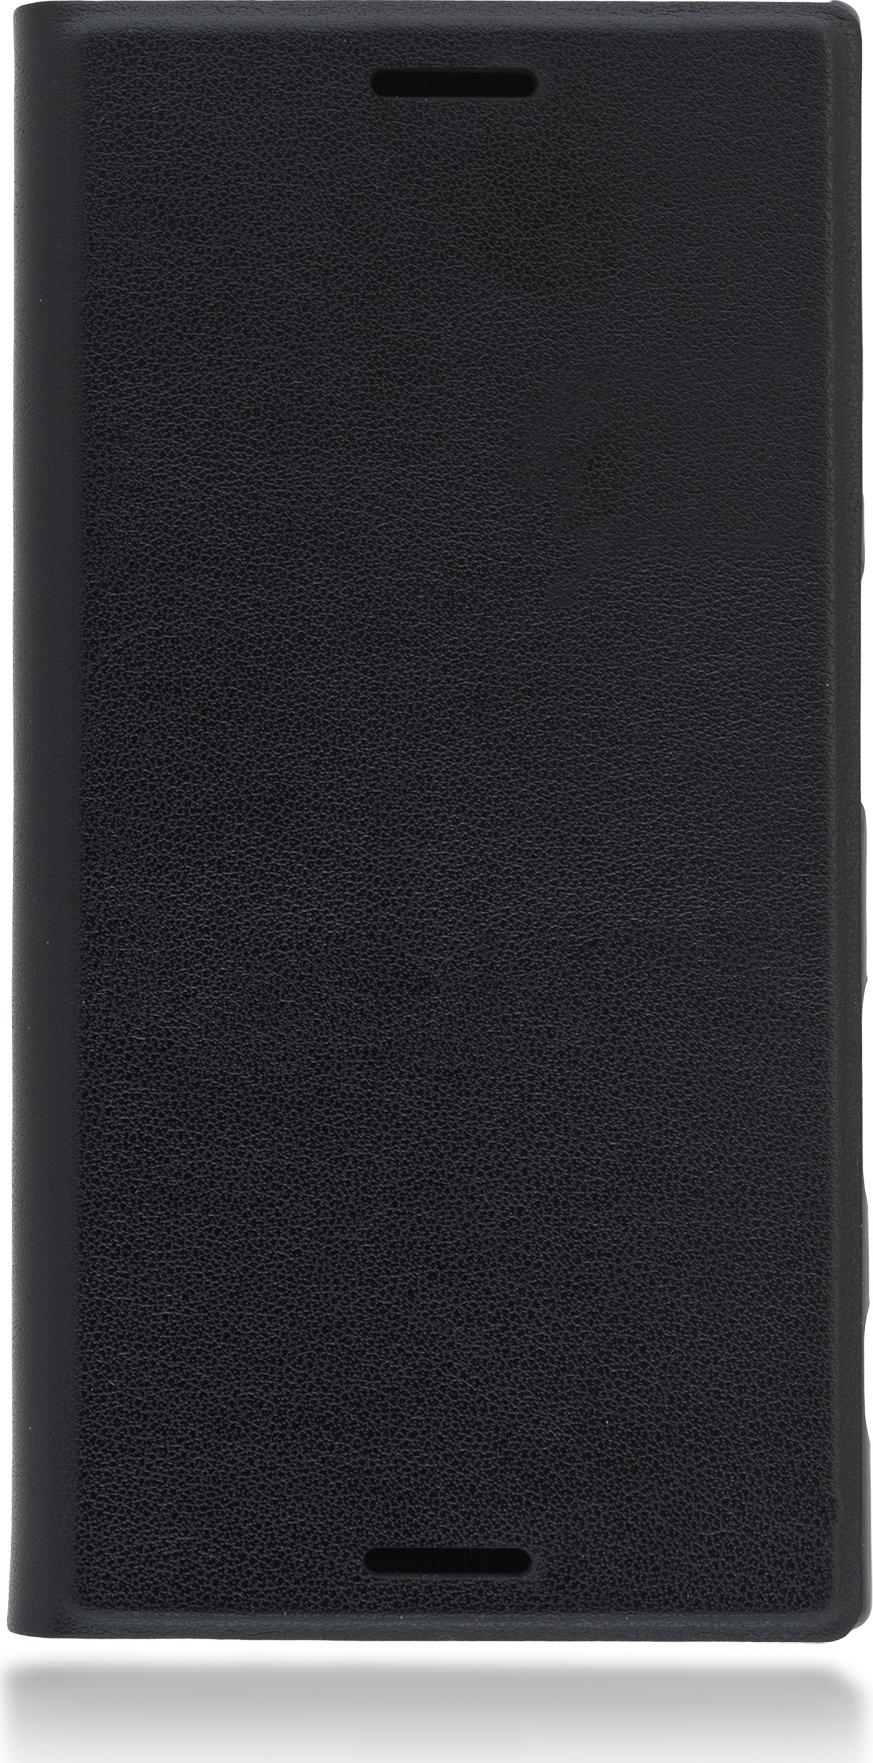 Чехол Brosco Book для Sony Xperia X Compact, черный цена и фото